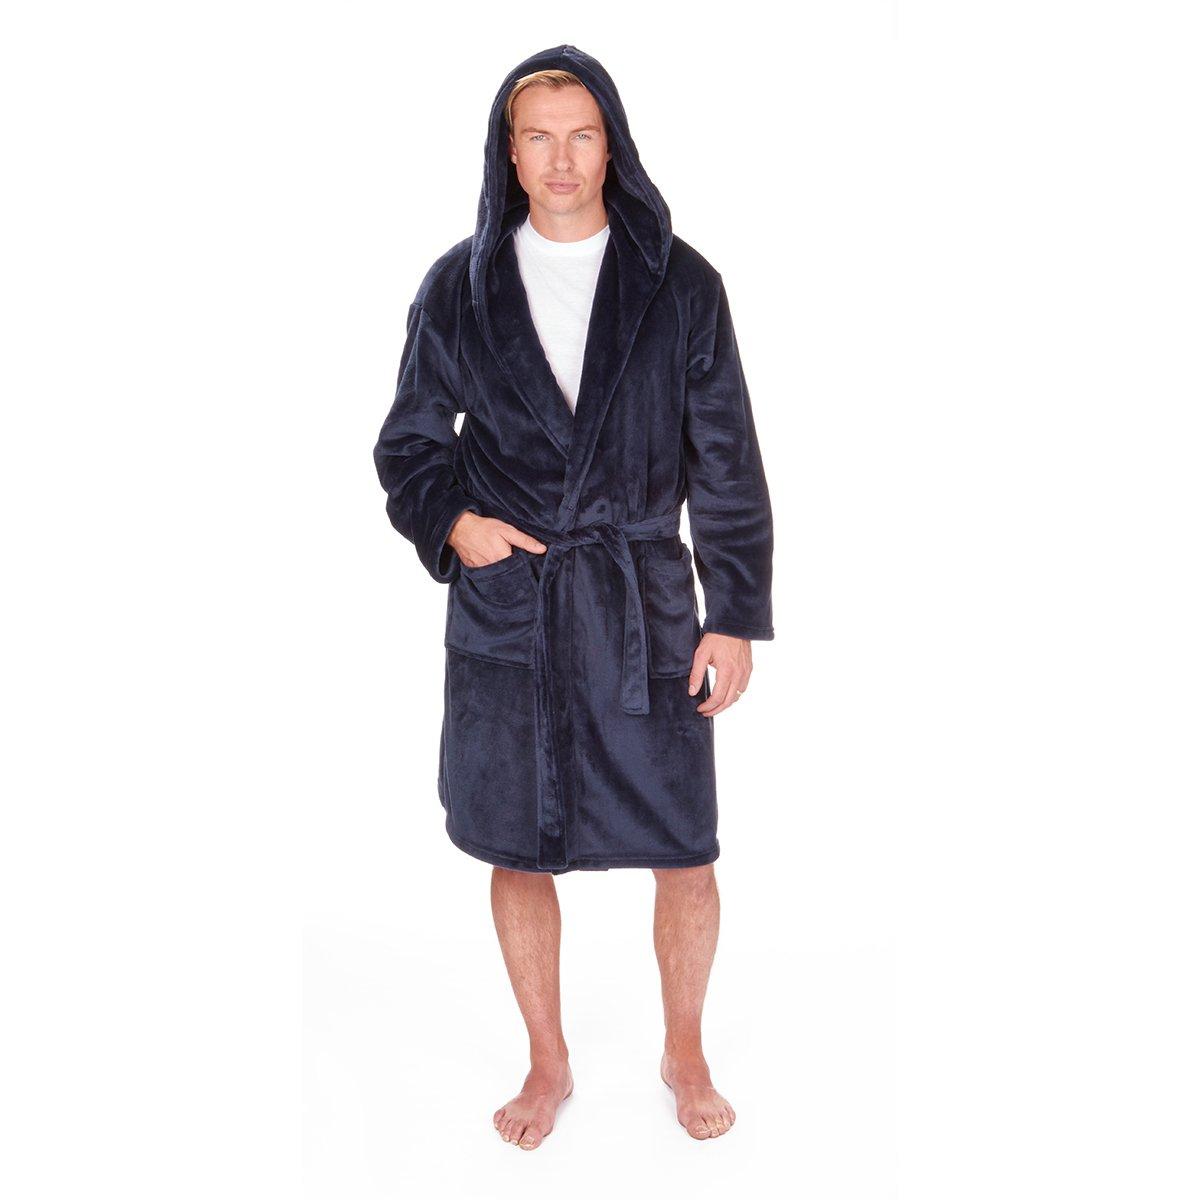 Pierre Roche - Big & Tall Men's Fleece Hooded Bathrobe with Pockets